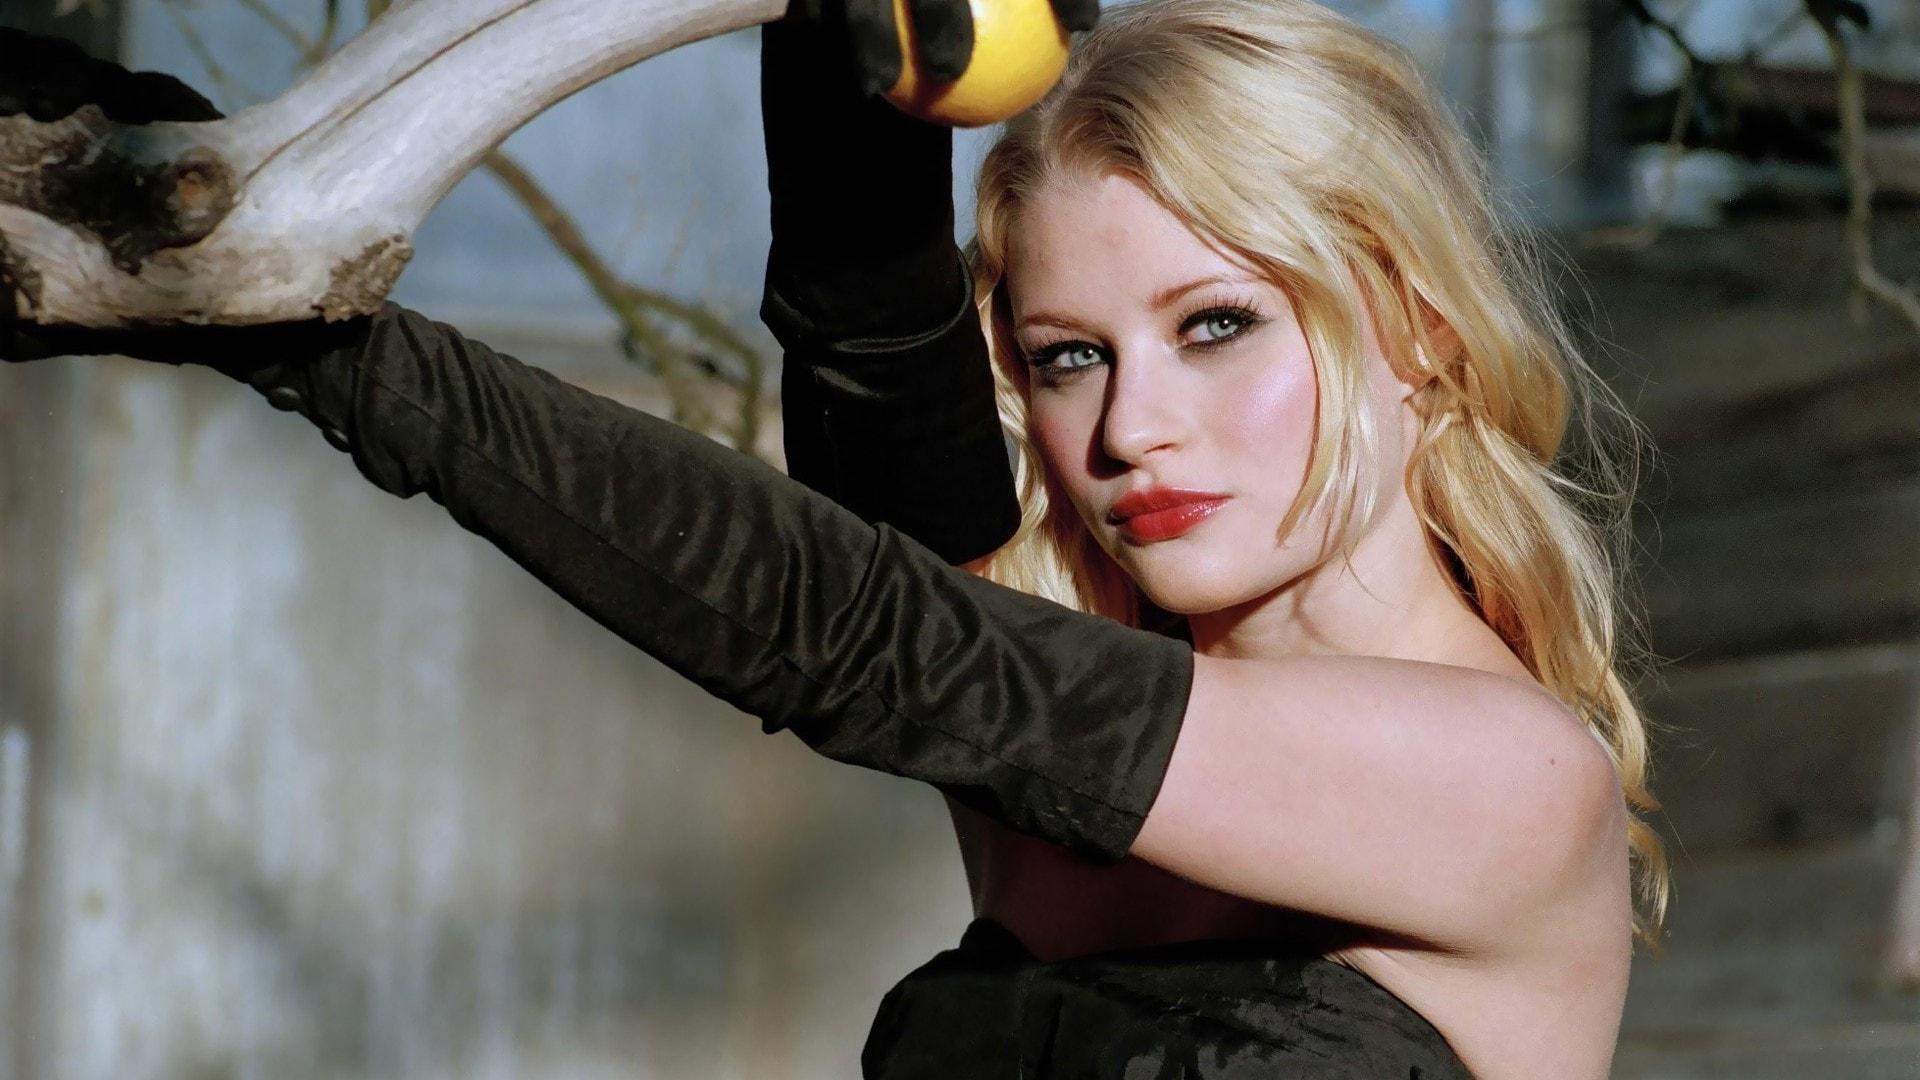 Emilie De Ravin Widescreen